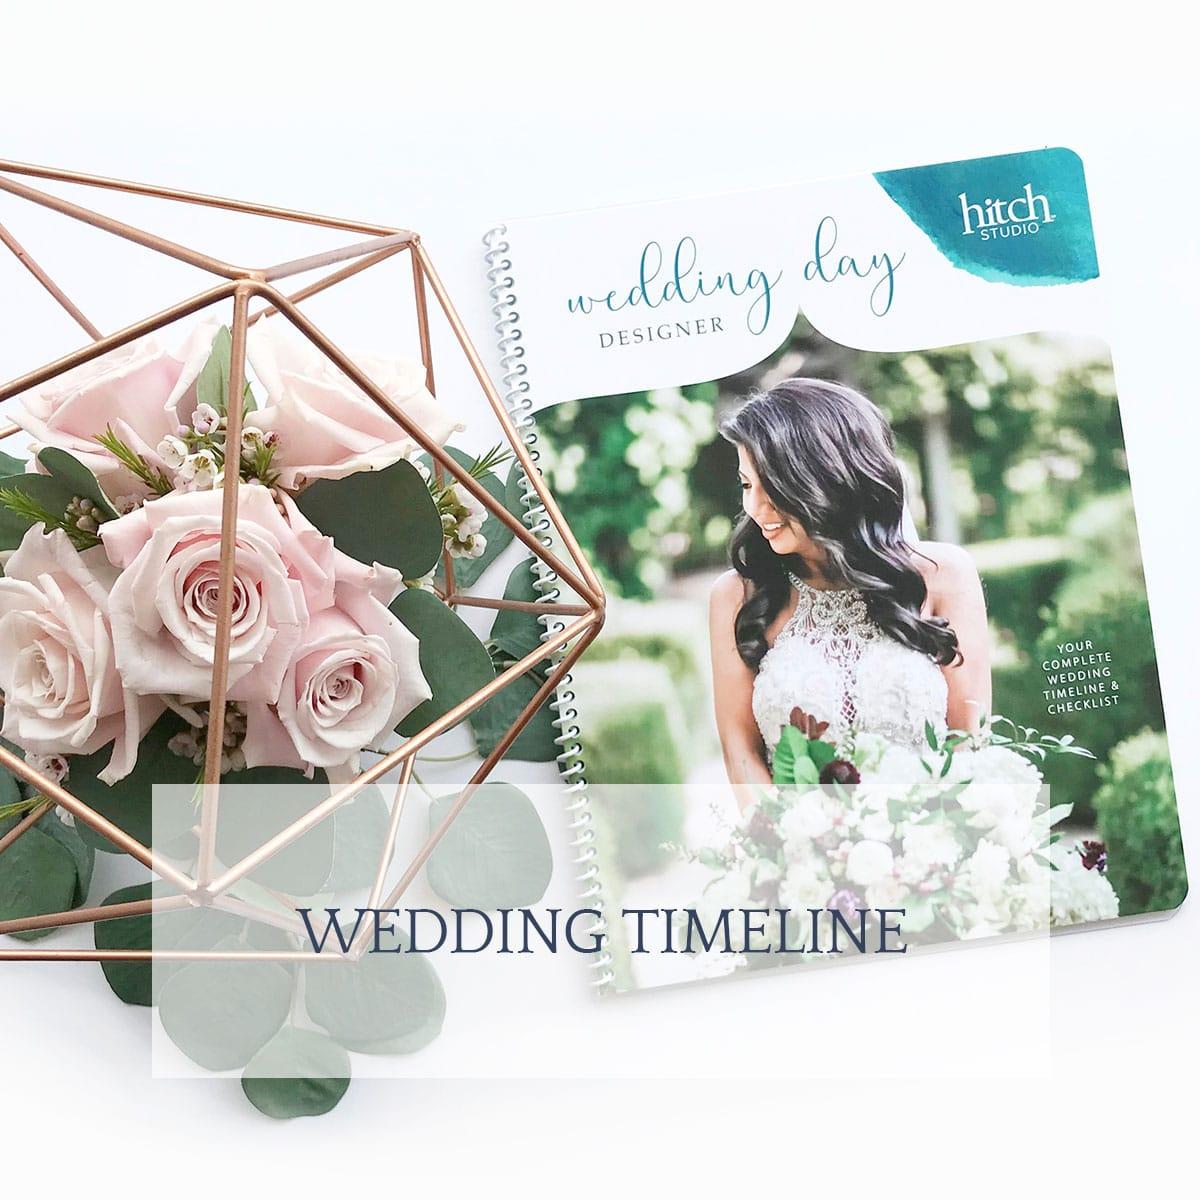 Weddign-Timeline_Home